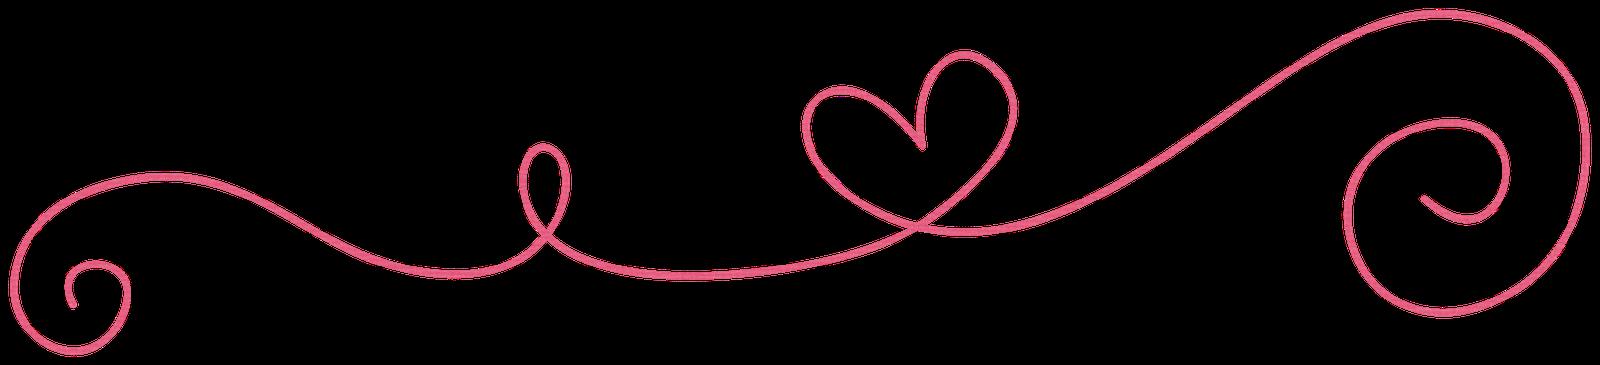 Divider clipart heart, Divider heart Transparent FREE for download ...